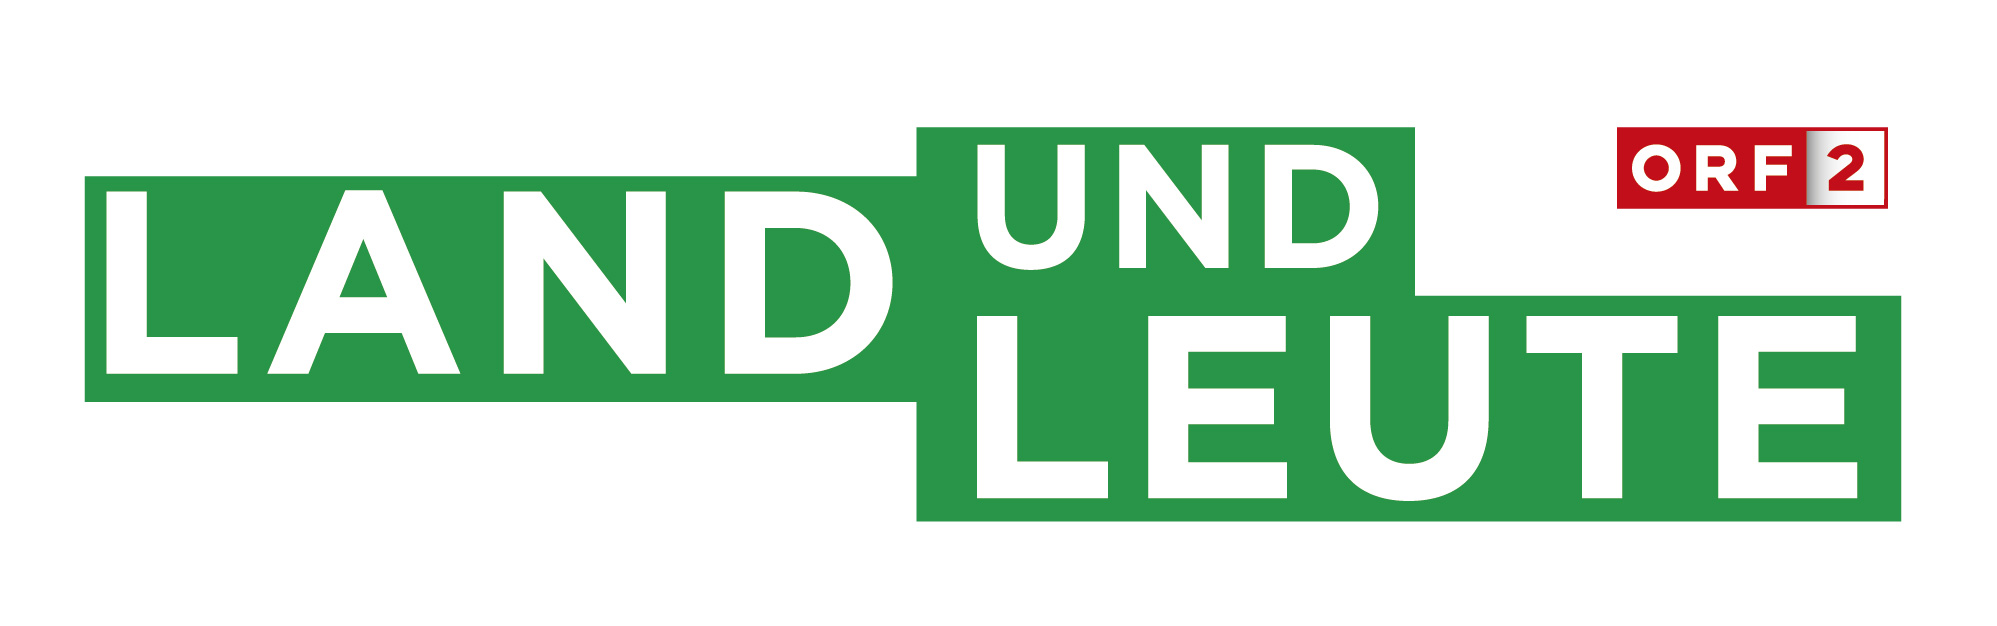 LandundLeute